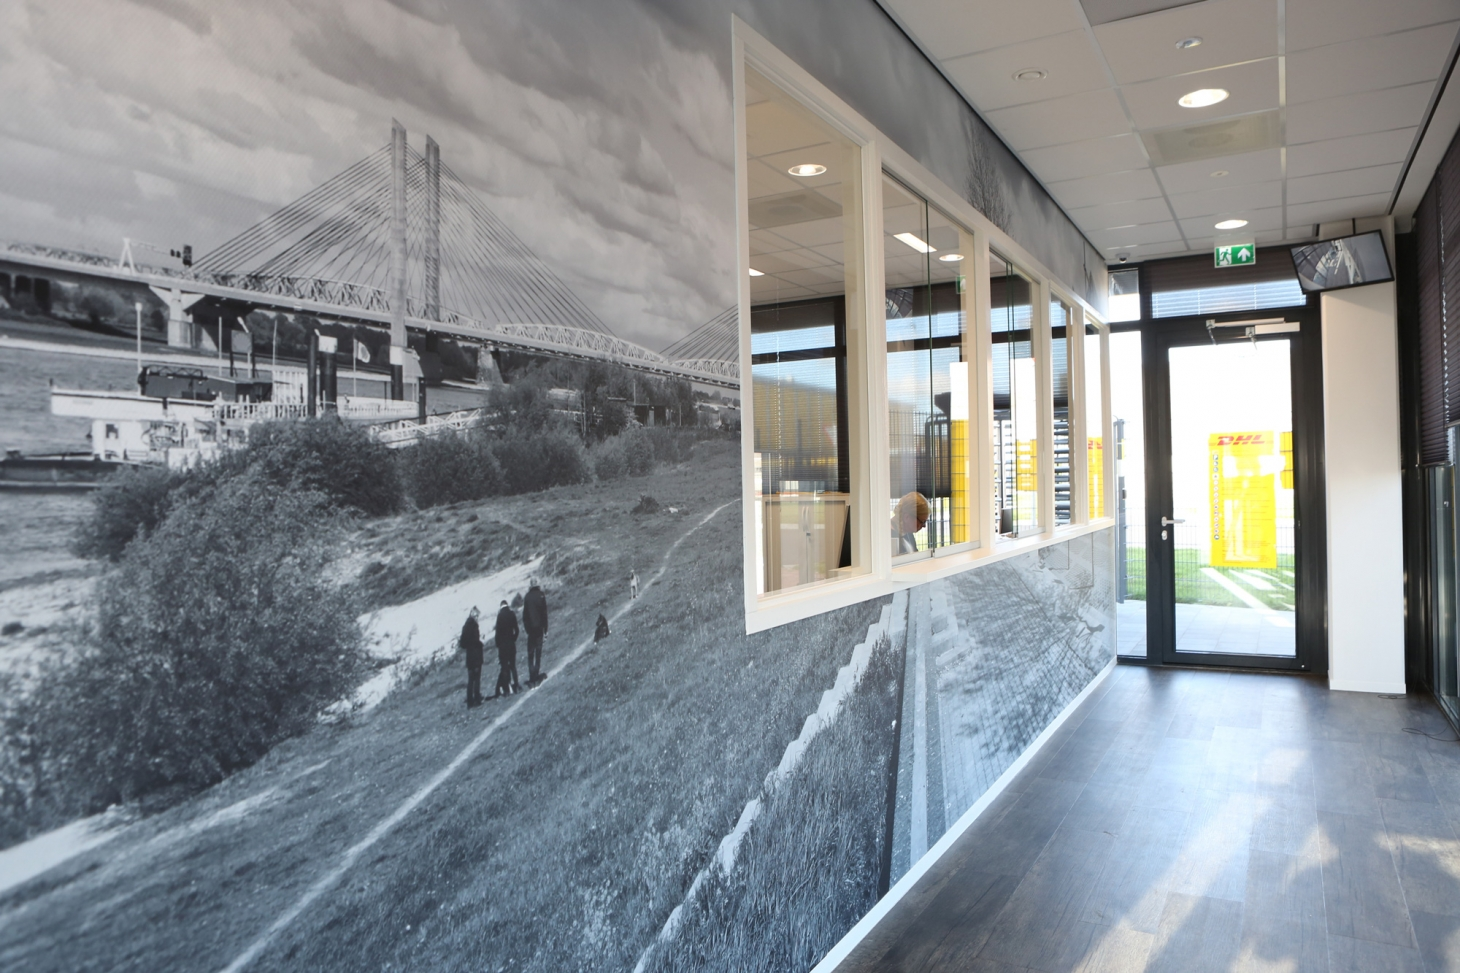 DJL Zaltbommel wandprint wallcovering airtex VIZIO signing